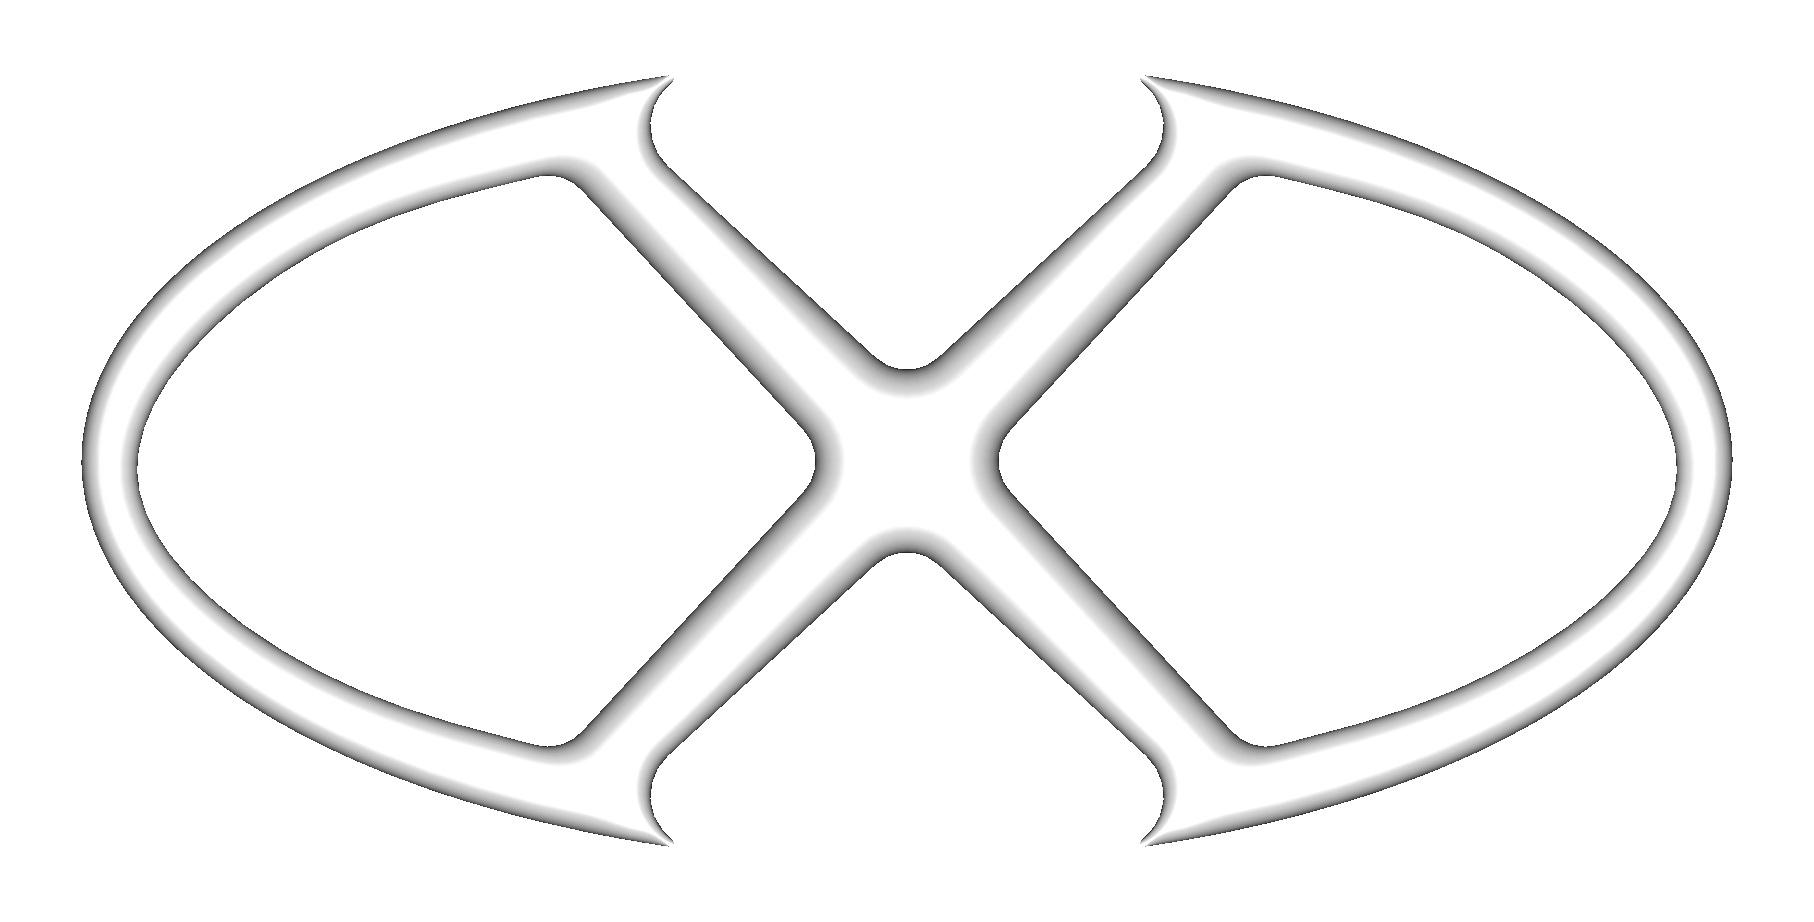 AE86 GT-S Wiper Harness